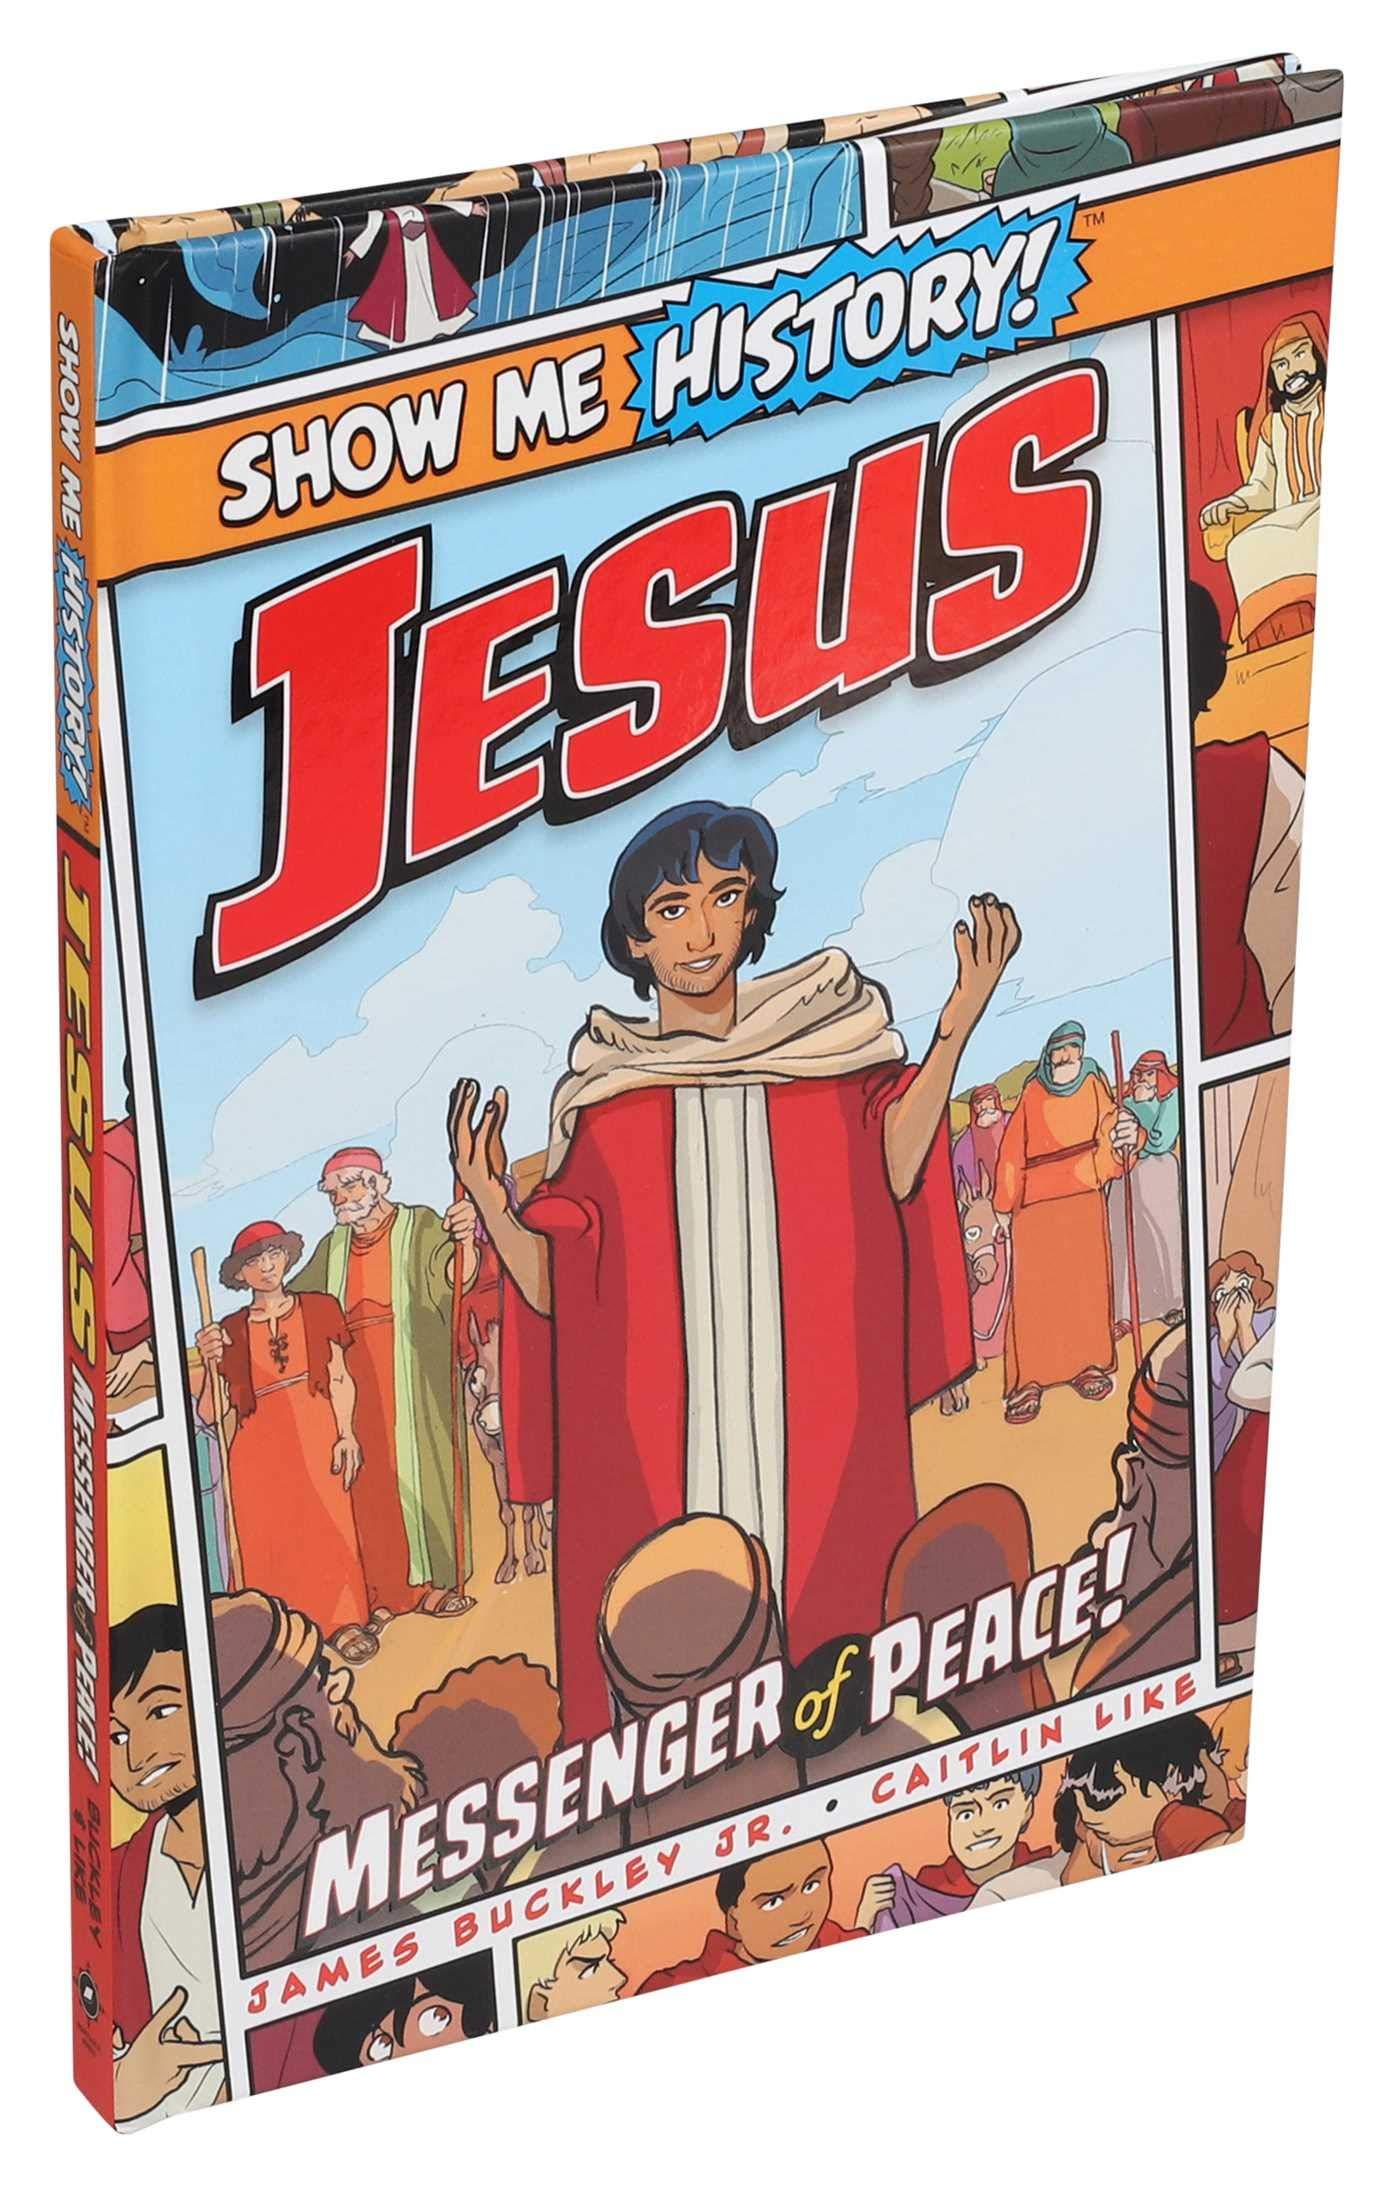 SHOW ME HISTORY JESUS MESSENGER OF PEACE ...